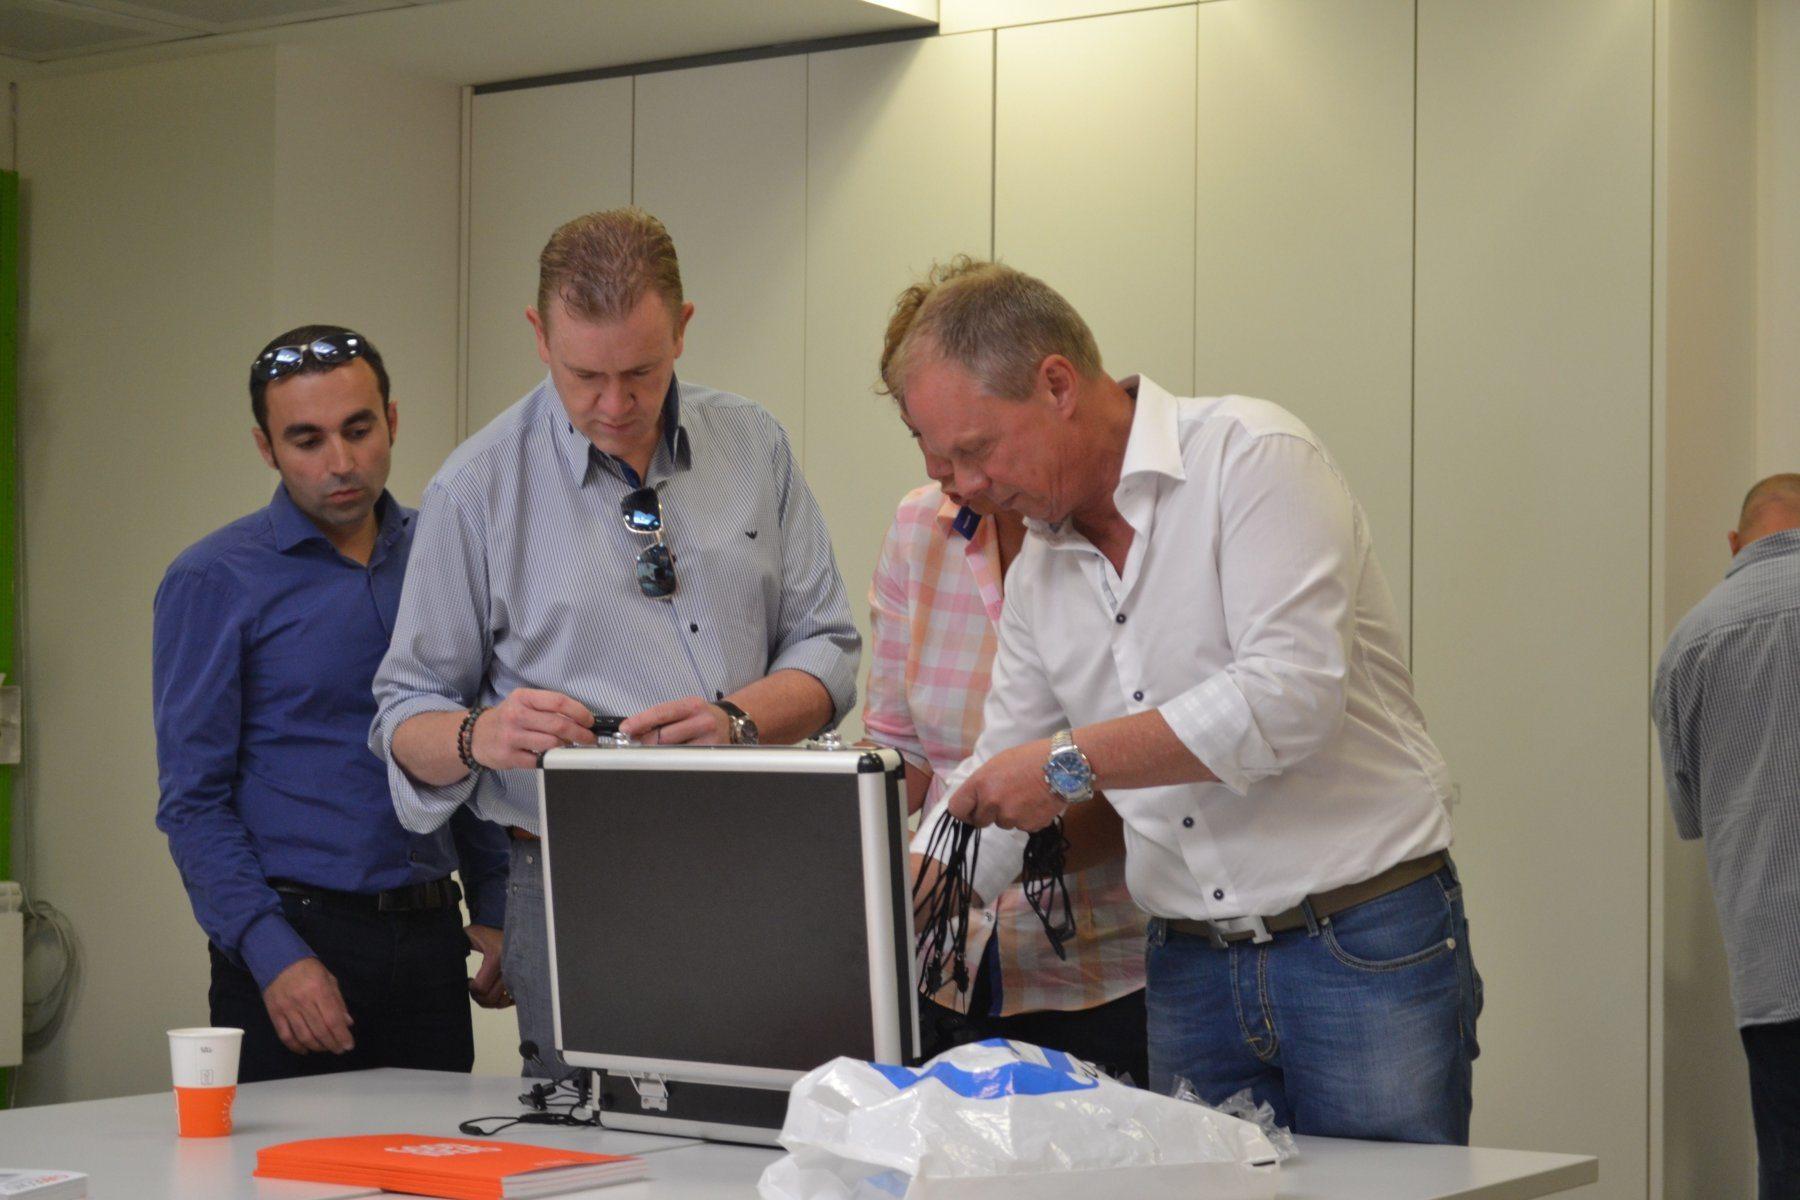 axitour-axiwi-begetube-communicatiesysteem-fabrieksrondleiding-communicatie-uitdelen